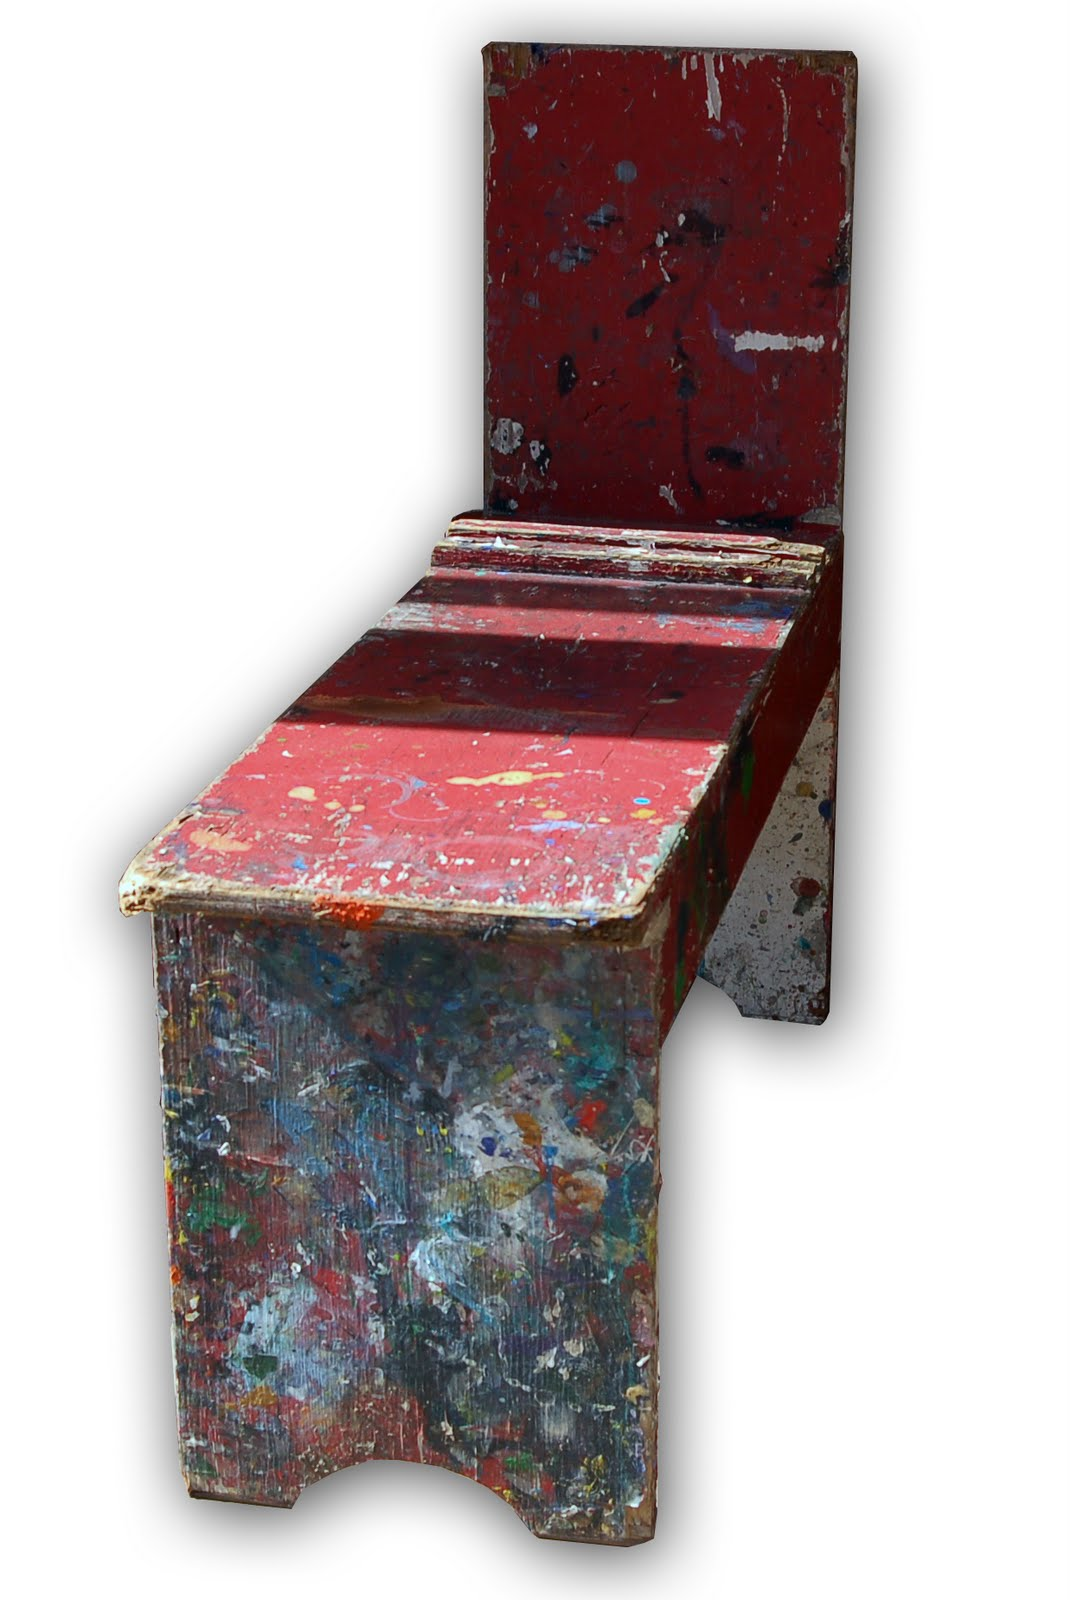 Drawn bench School Bench Drawing Drawing as